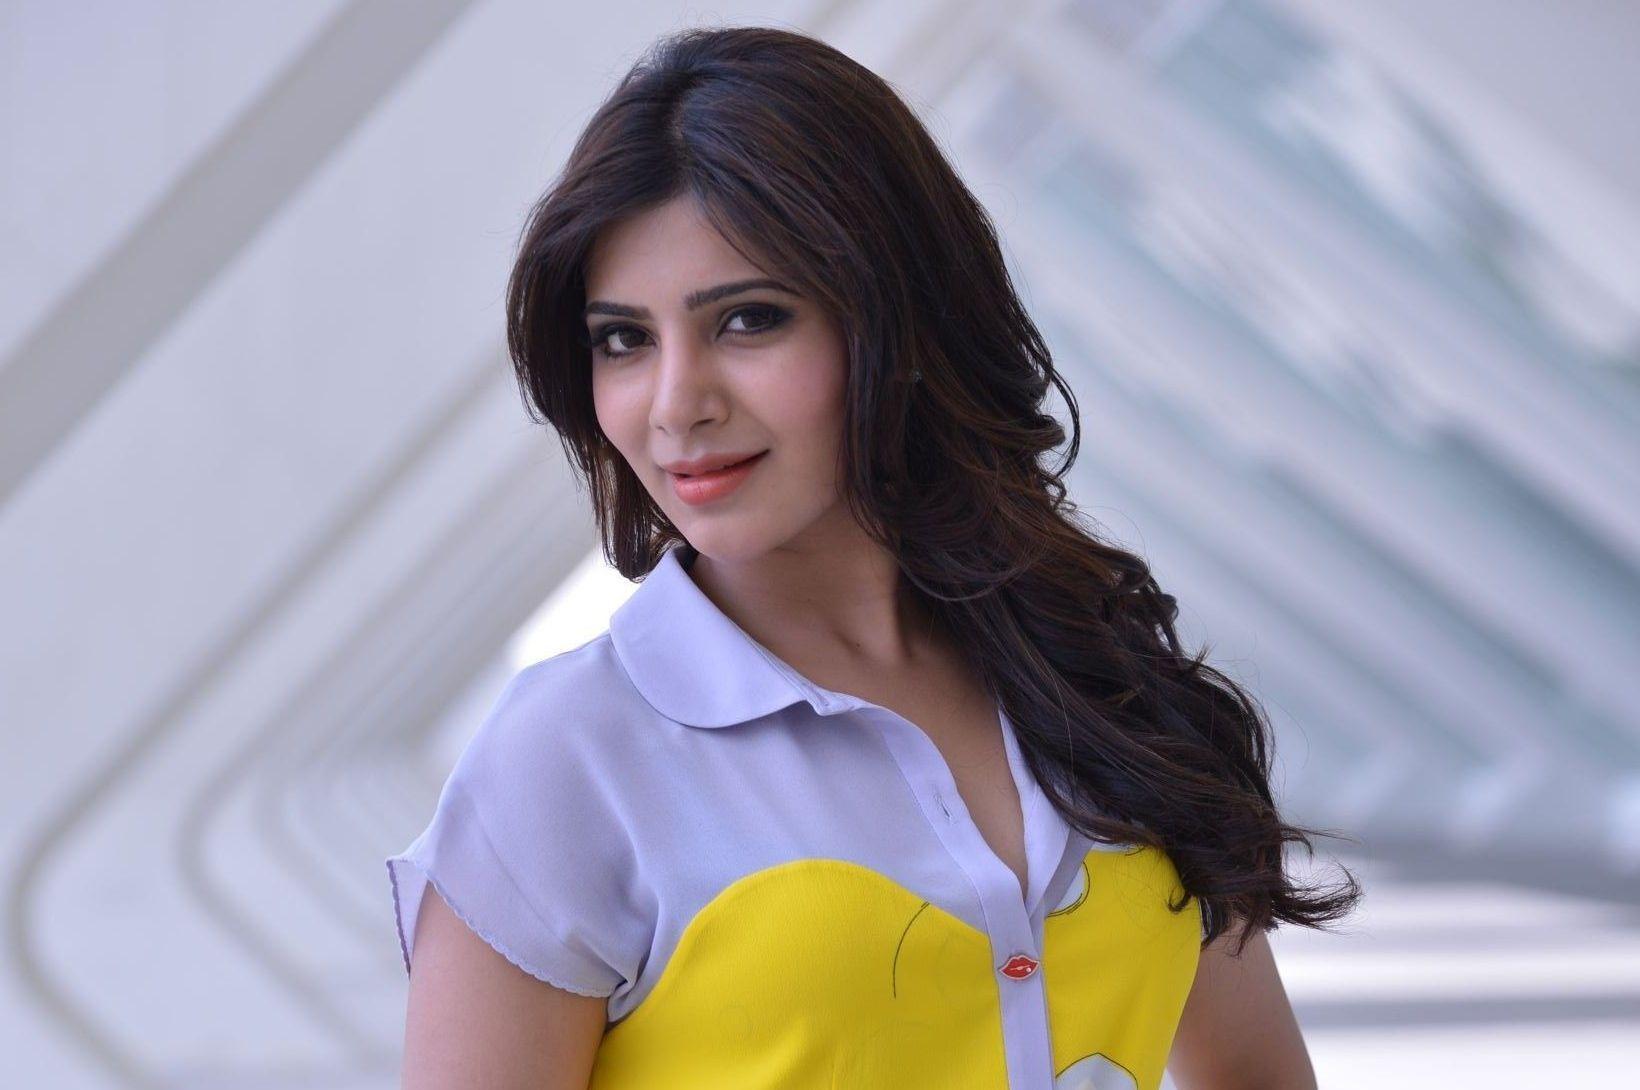 Samantha Tamil Wallpapers Top Free Samantha Tamil Backgrounds